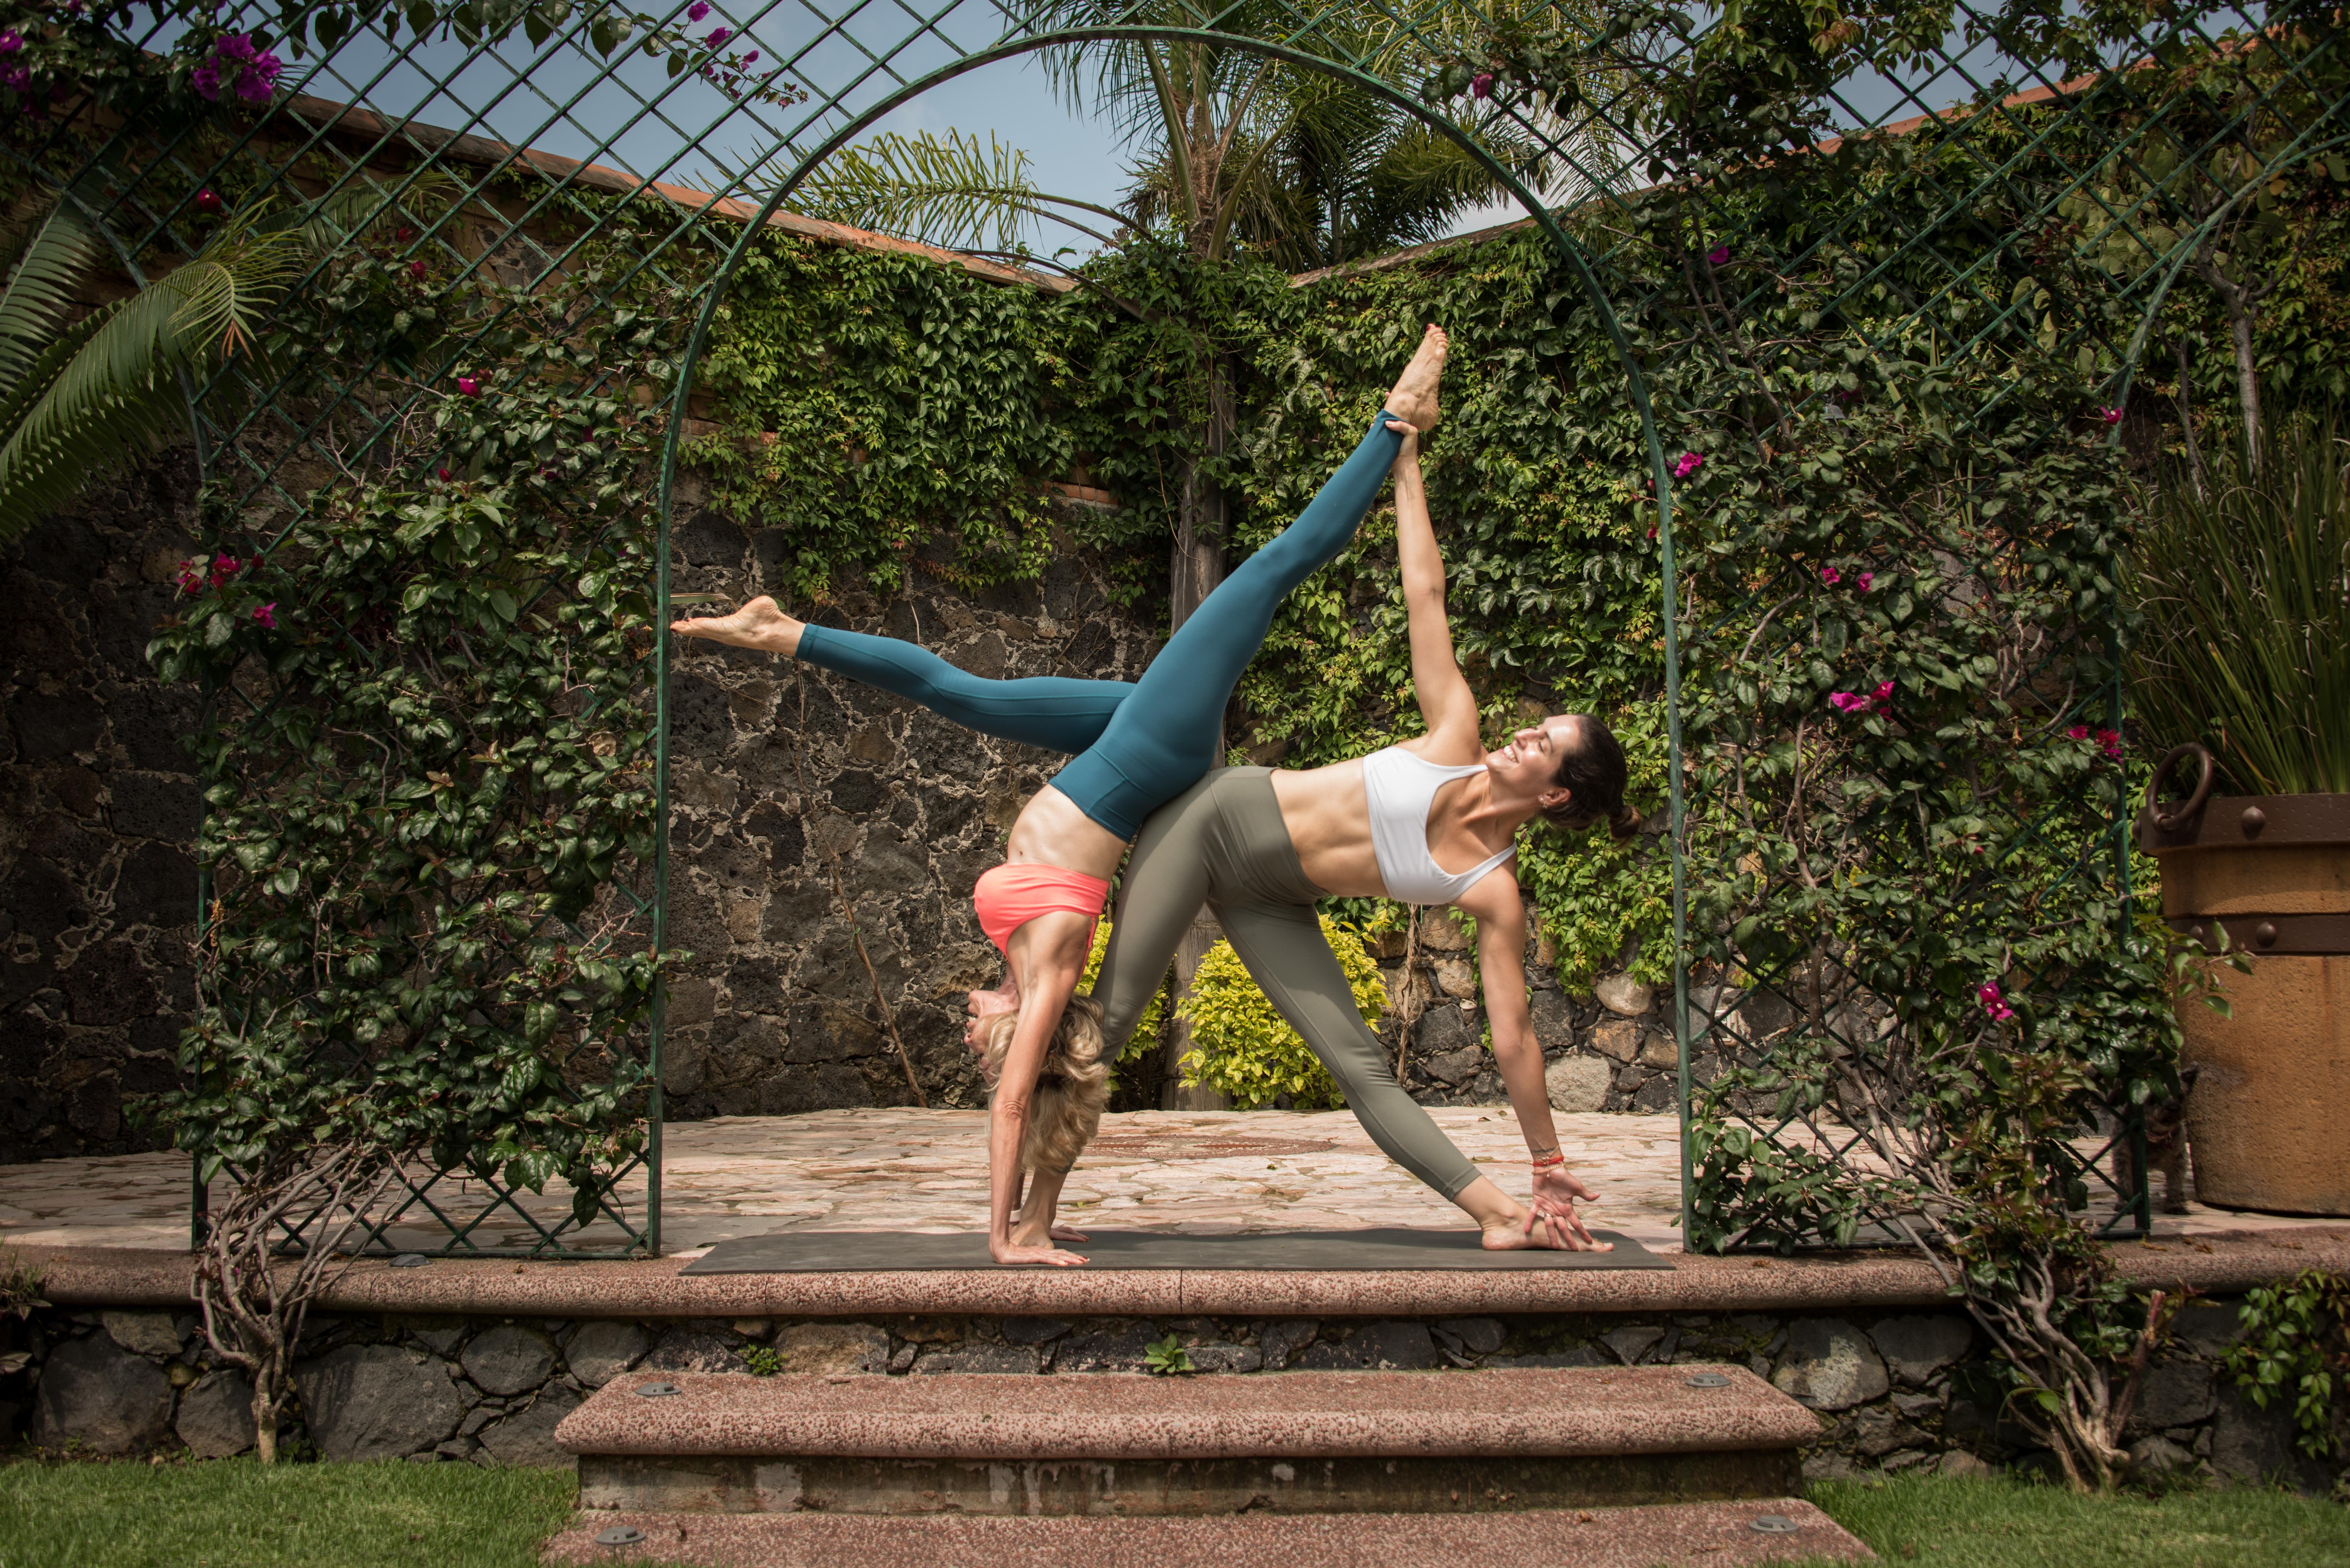 Mariel W. & Tania Witmond / Acroyoga